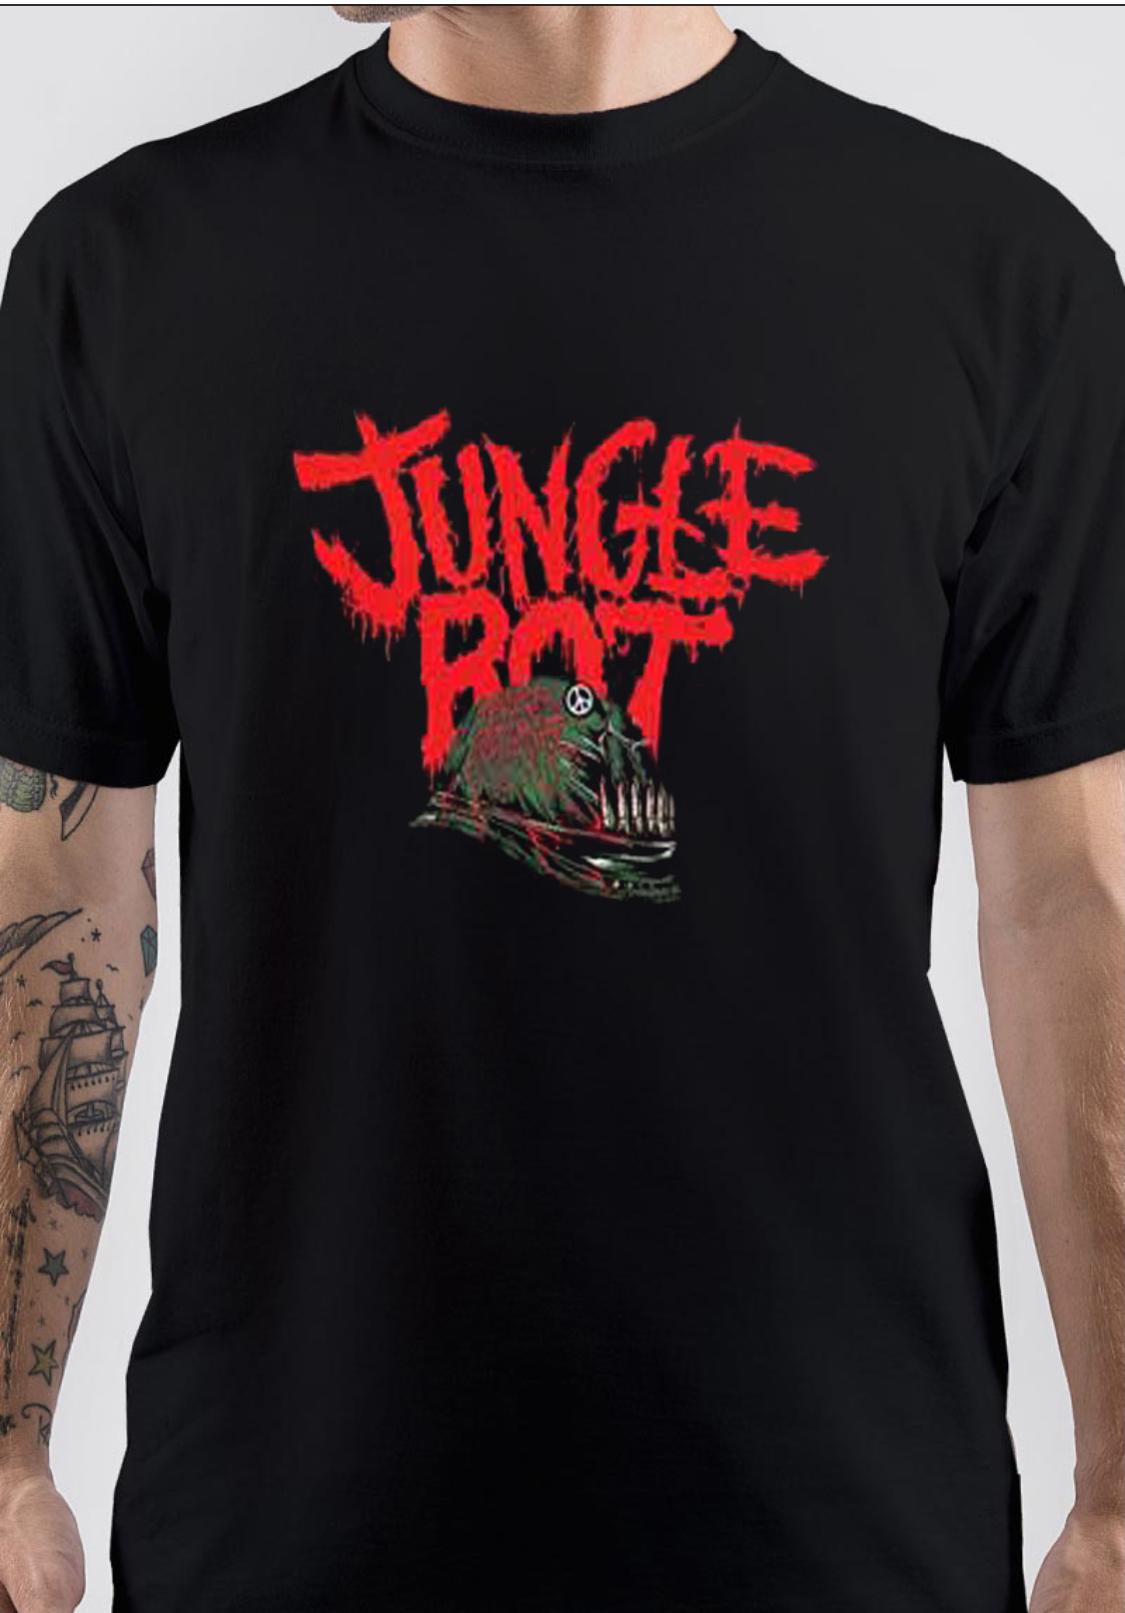 Jungle Rot T-Shirt And Merchandise